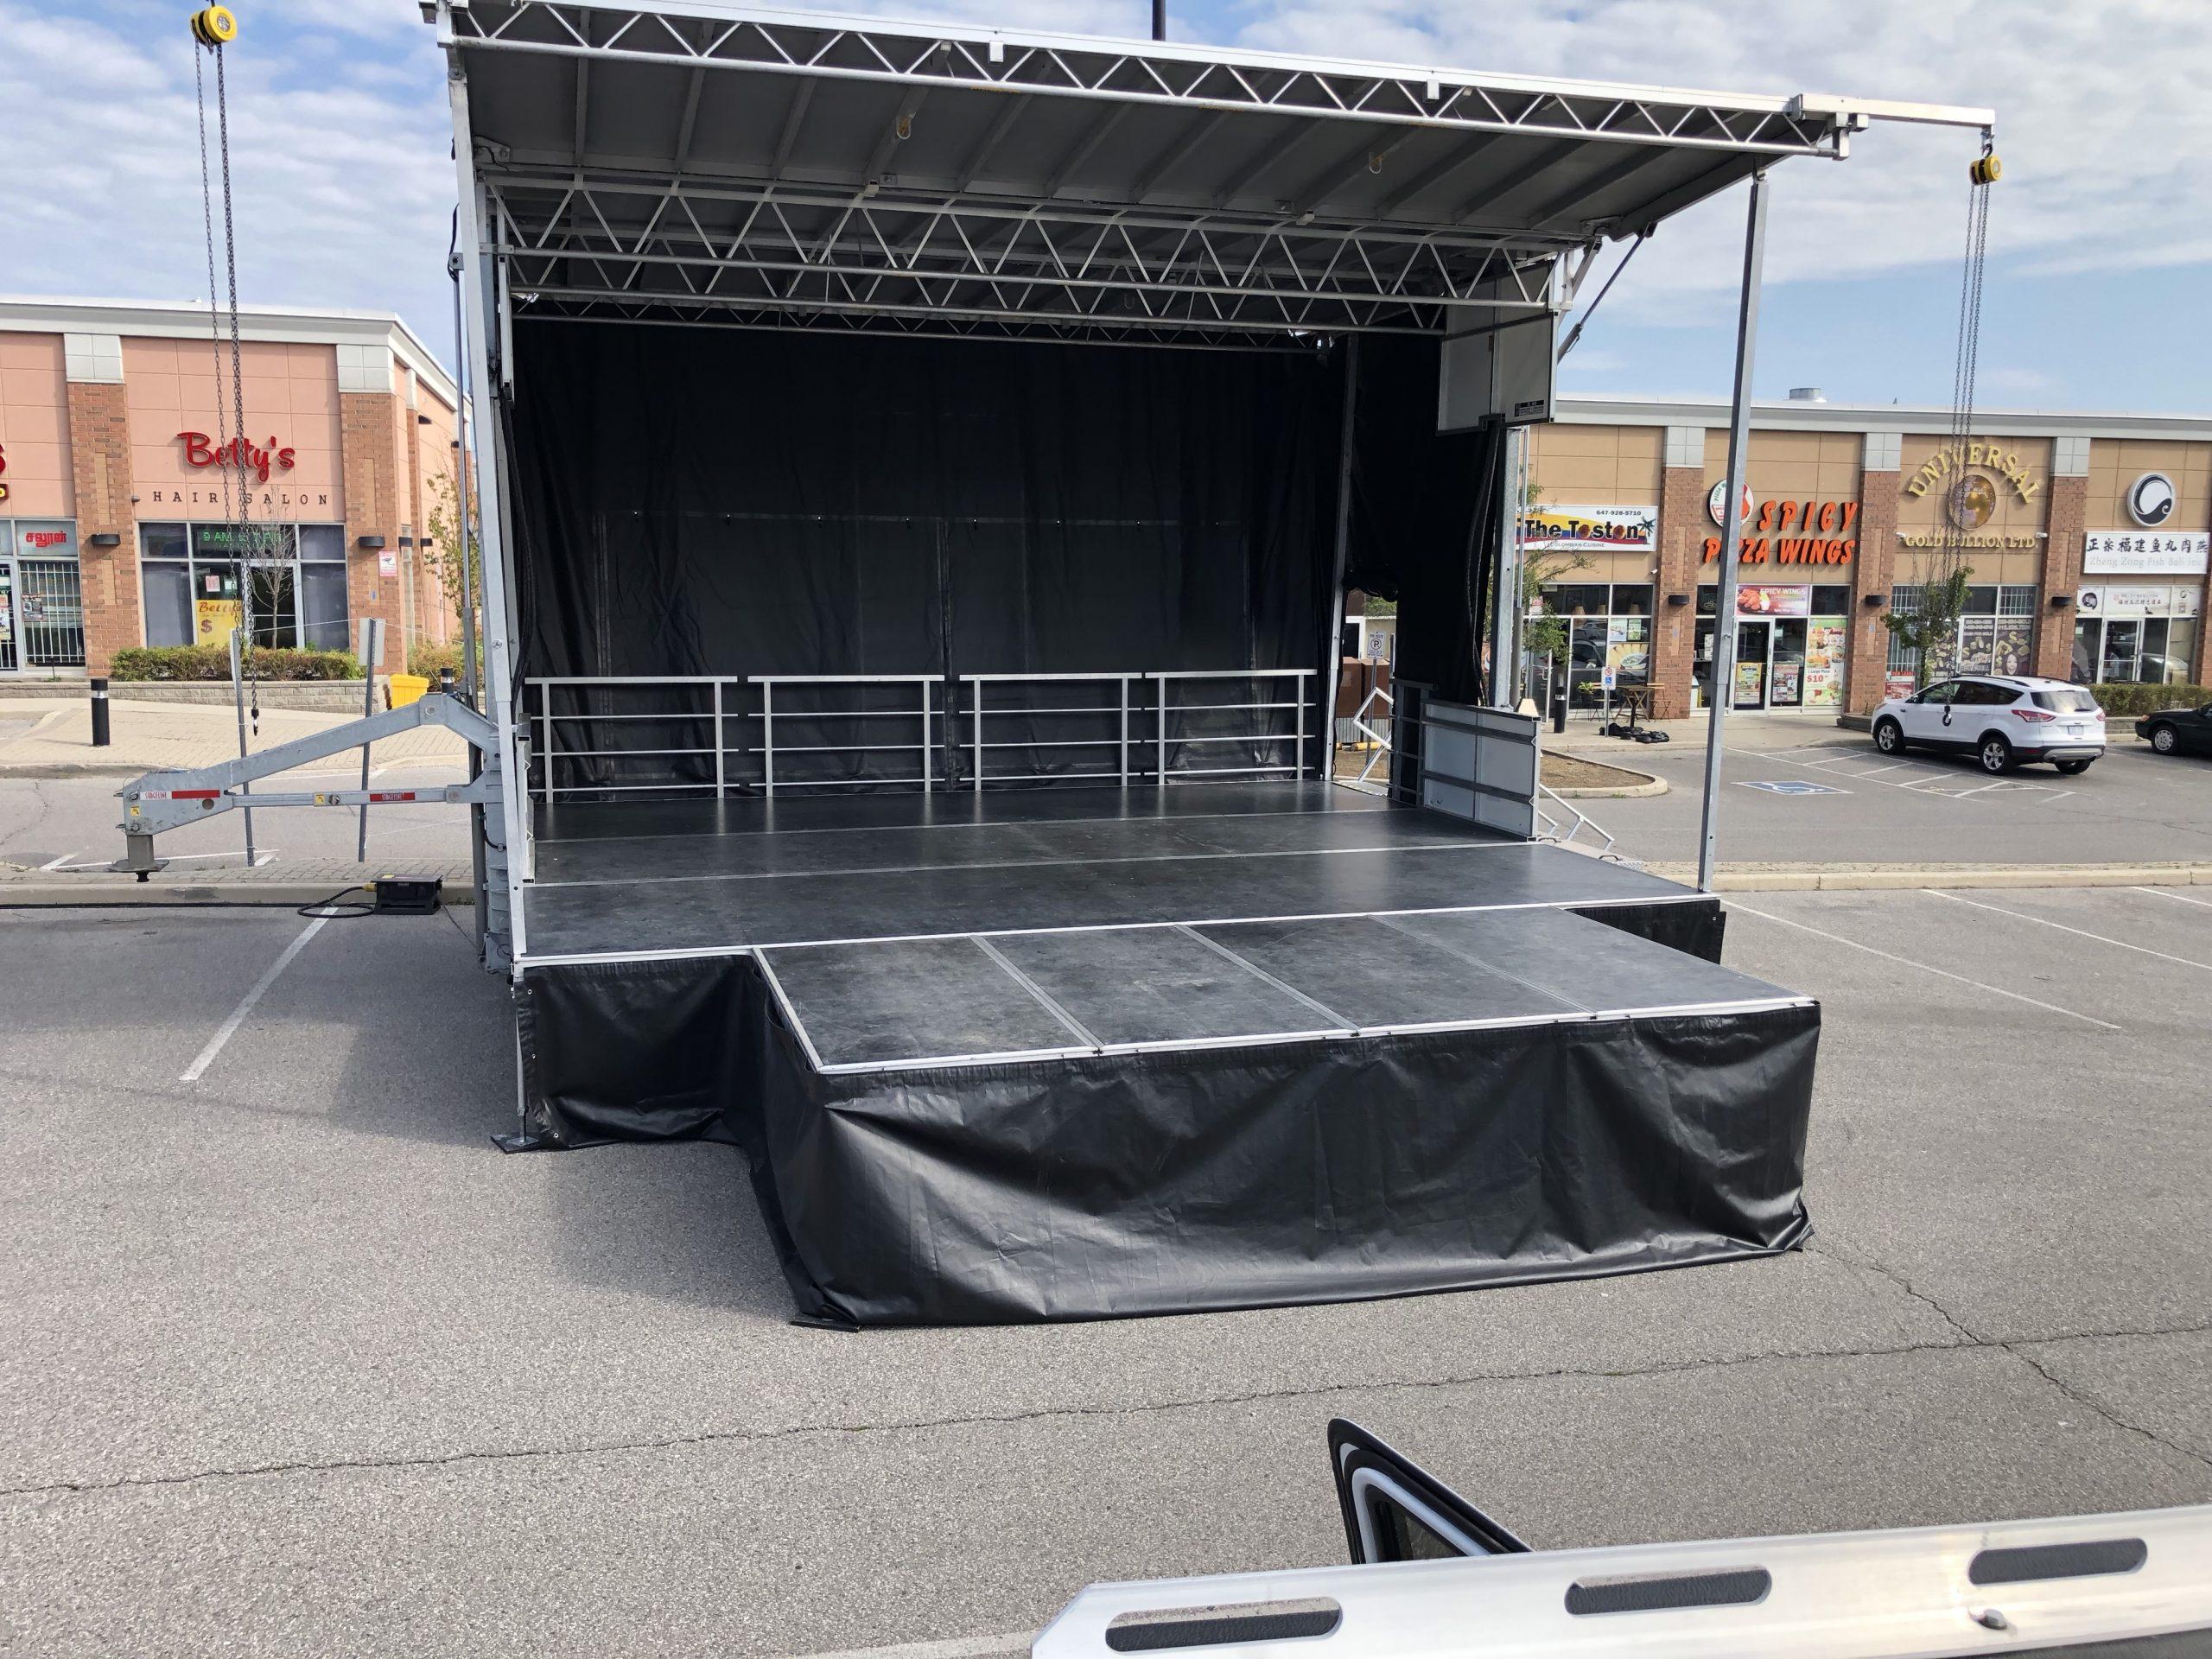 Rent a Stage SL100 Markham Cultural Festival